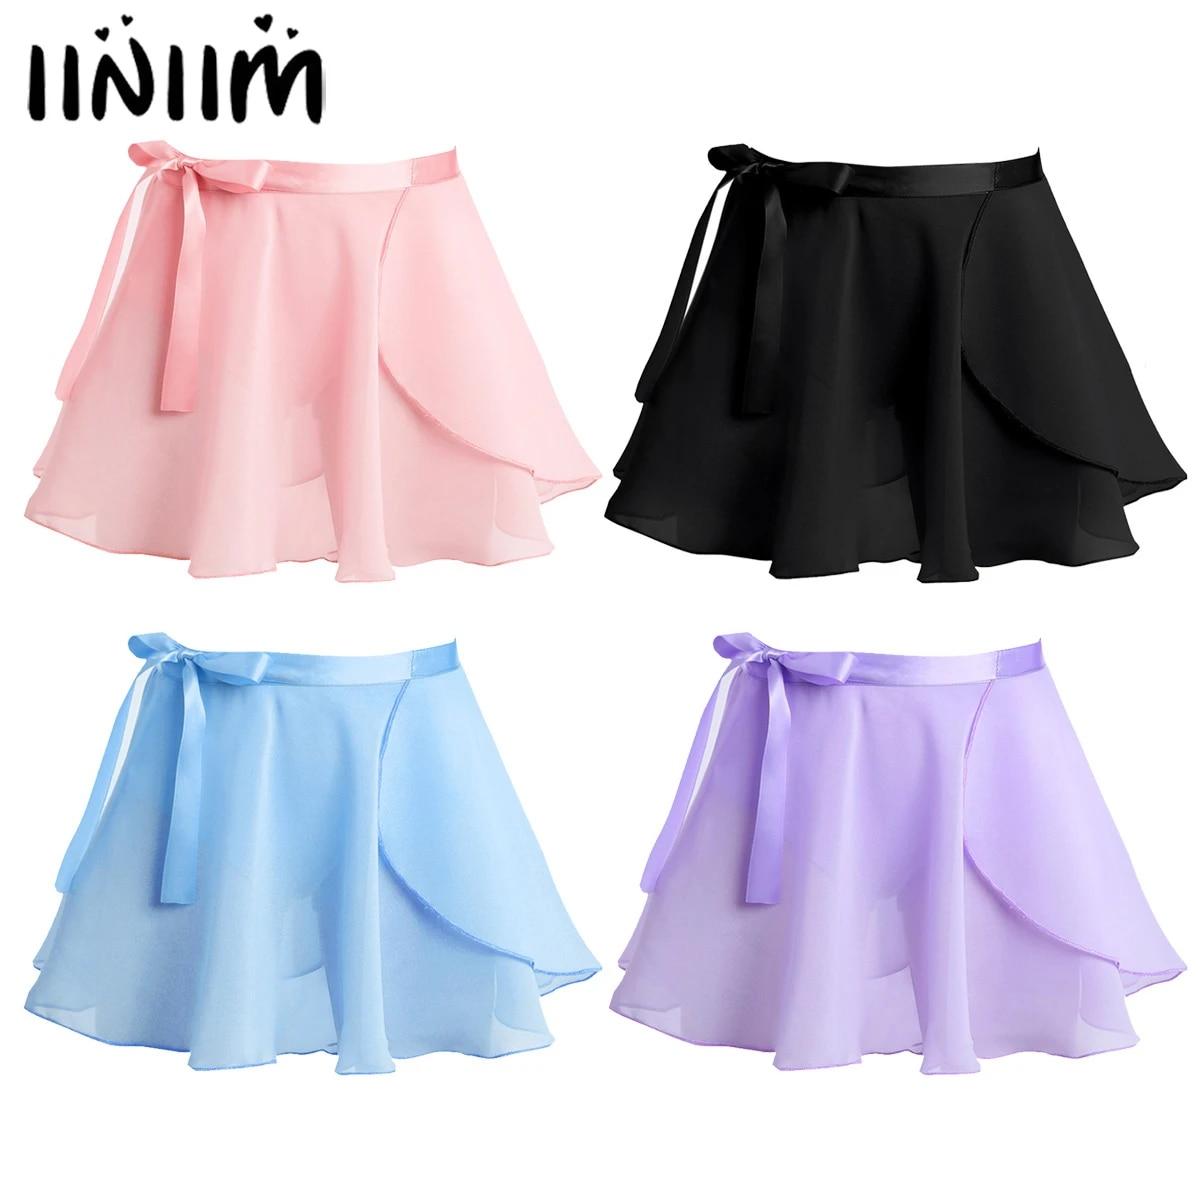 winying Girls Chiffon Elastic Waist Ribbons Full Circle Skirt Dancewear Daily Wear